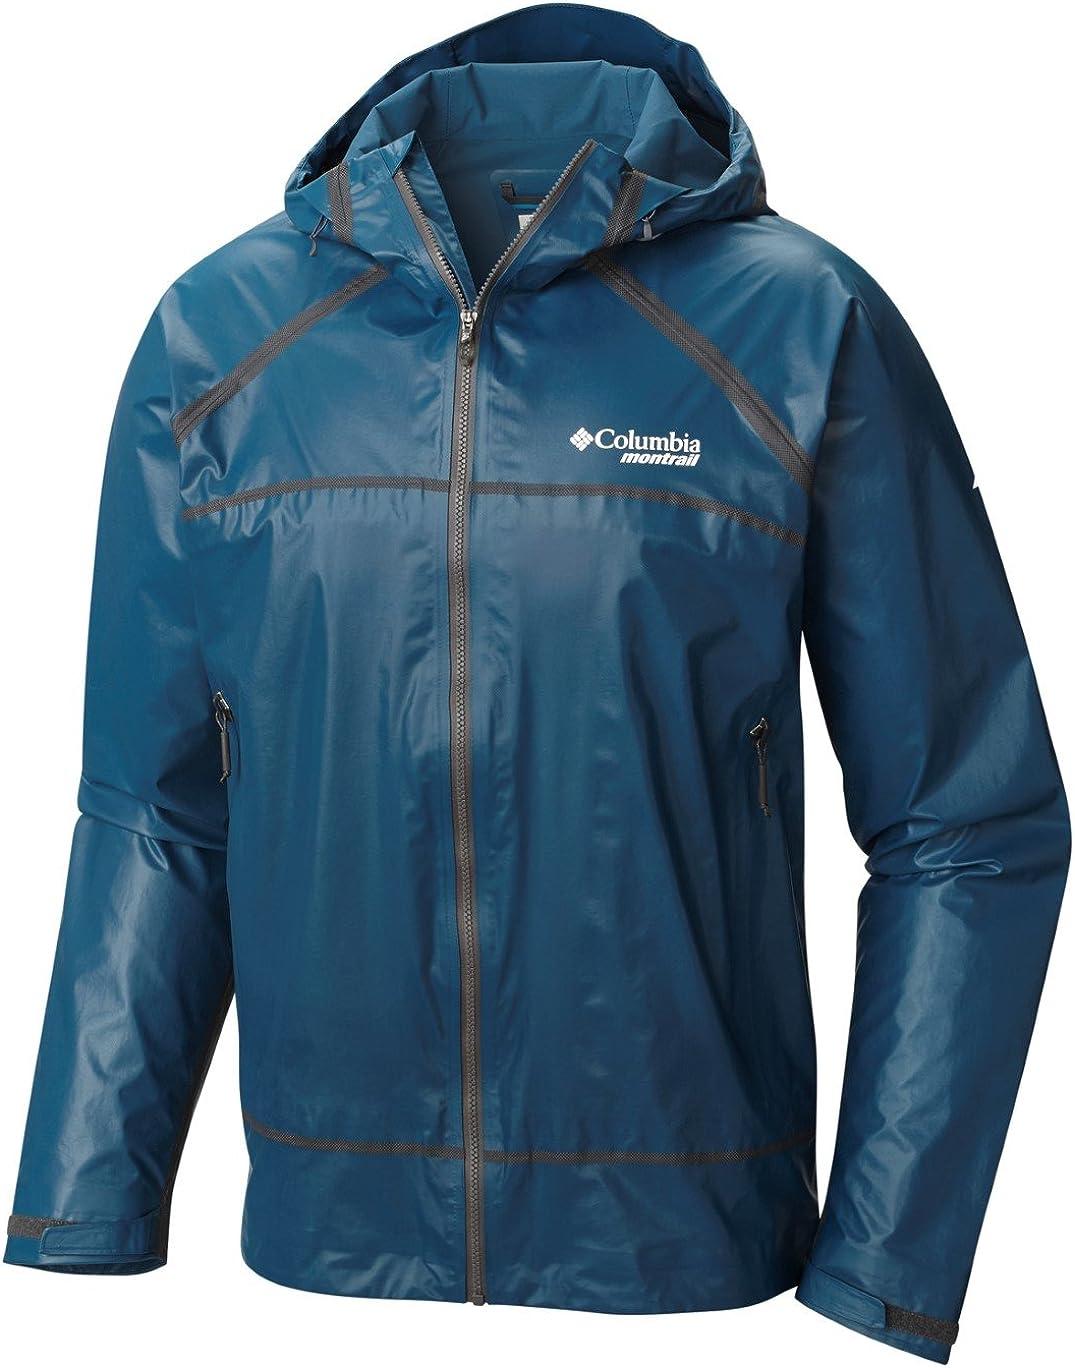 Columbia Men's Outdry Ex Light Shell Jacket